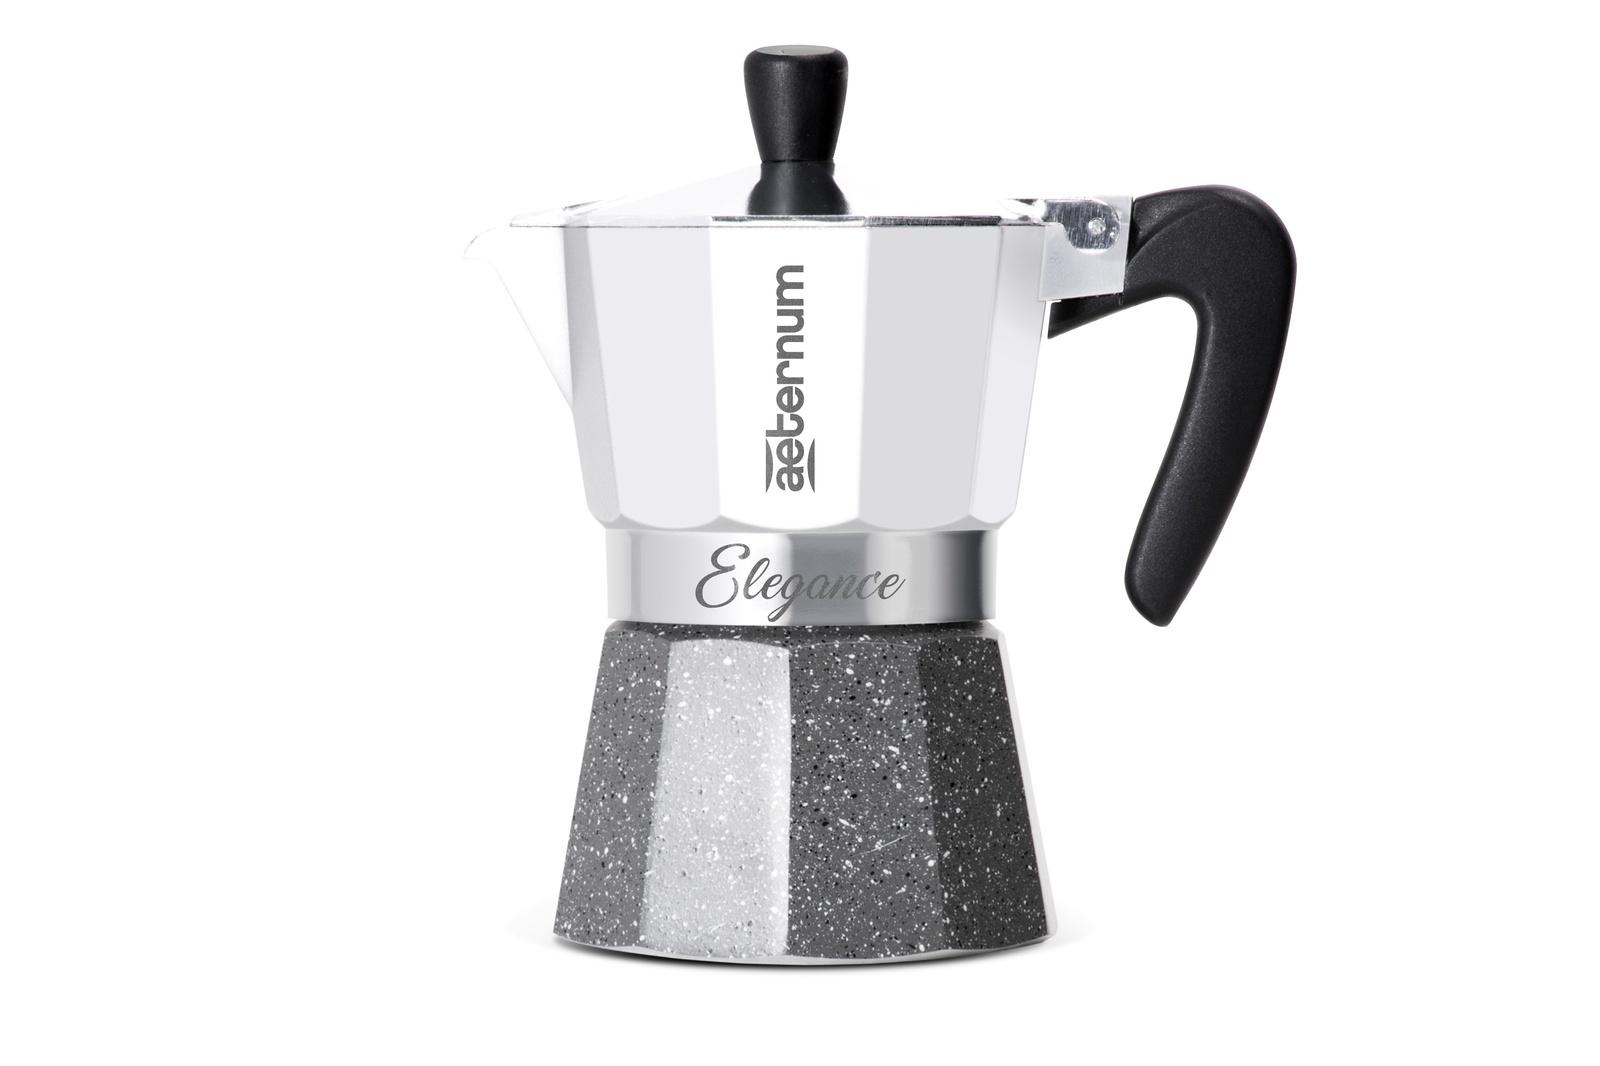 Гейзерная кофеварка Bialetti Aeternum Elegance, на 3 чашки, белый кофеварка гейзерная bialetti moka induzione 3 порции сталь 4922